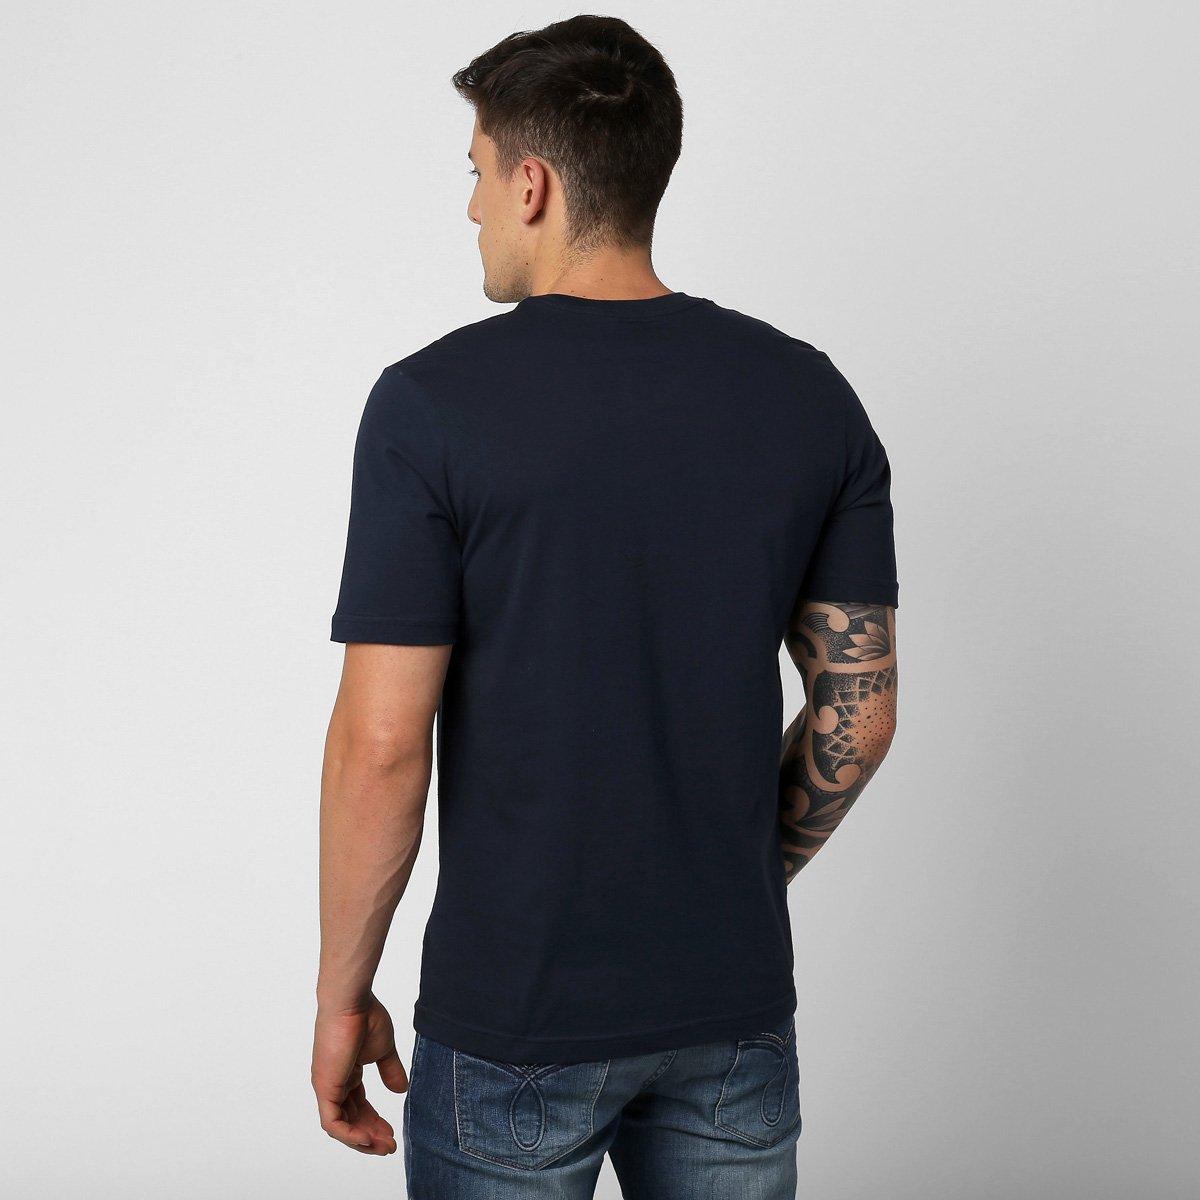 510e9b1dfc Camiseta Nike Personalizável  Camiseta Nike Personalizável ...